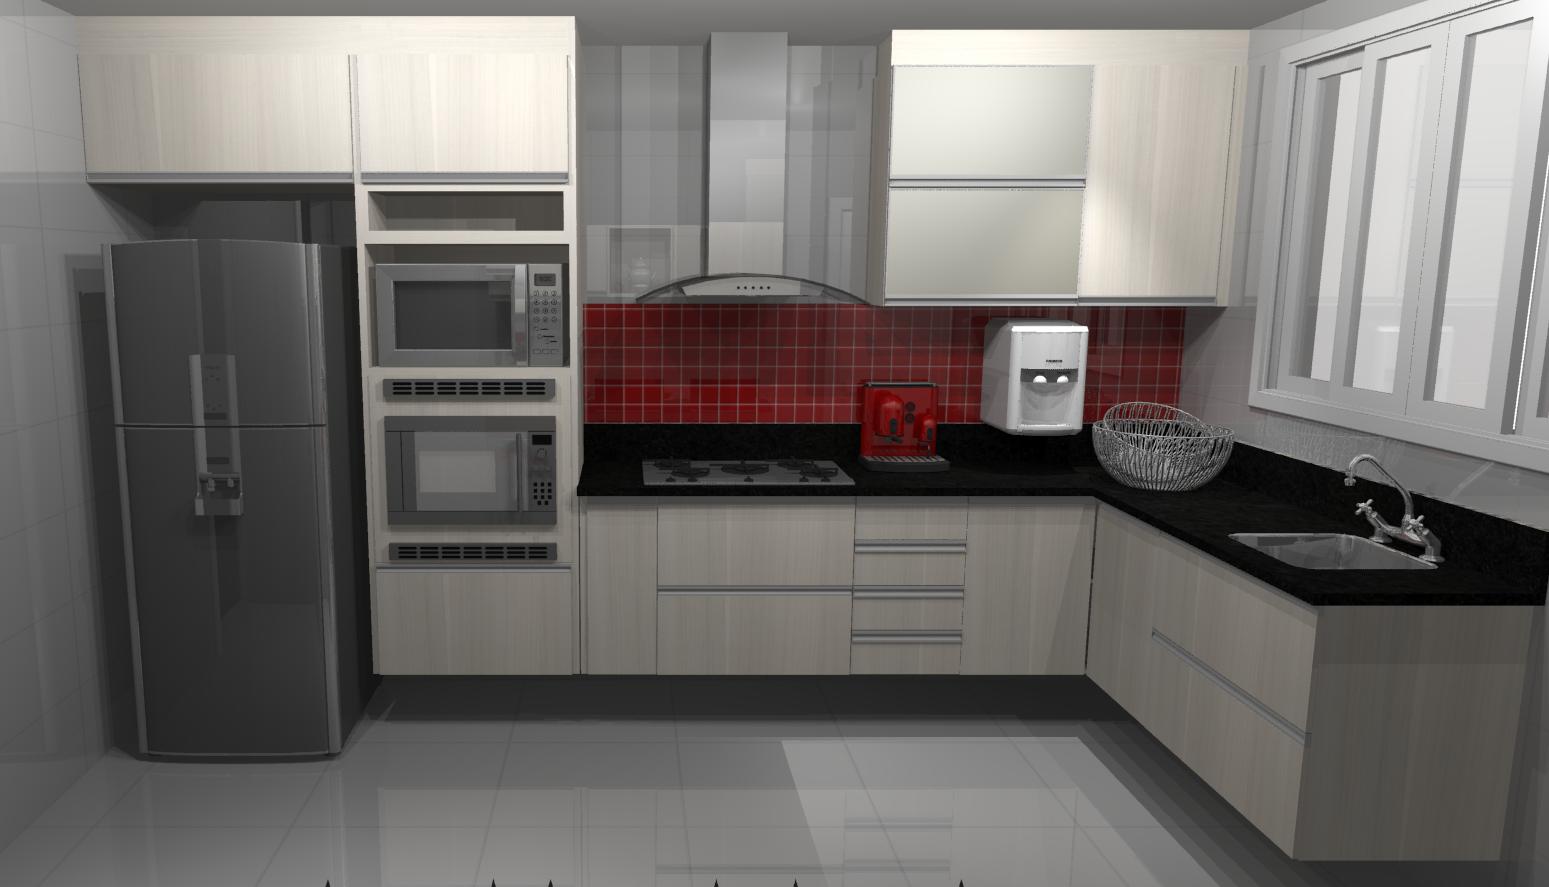 Kleines l küchendesign rio decor cozinhas planejadas  pesquisa google  cocinas  pinterest